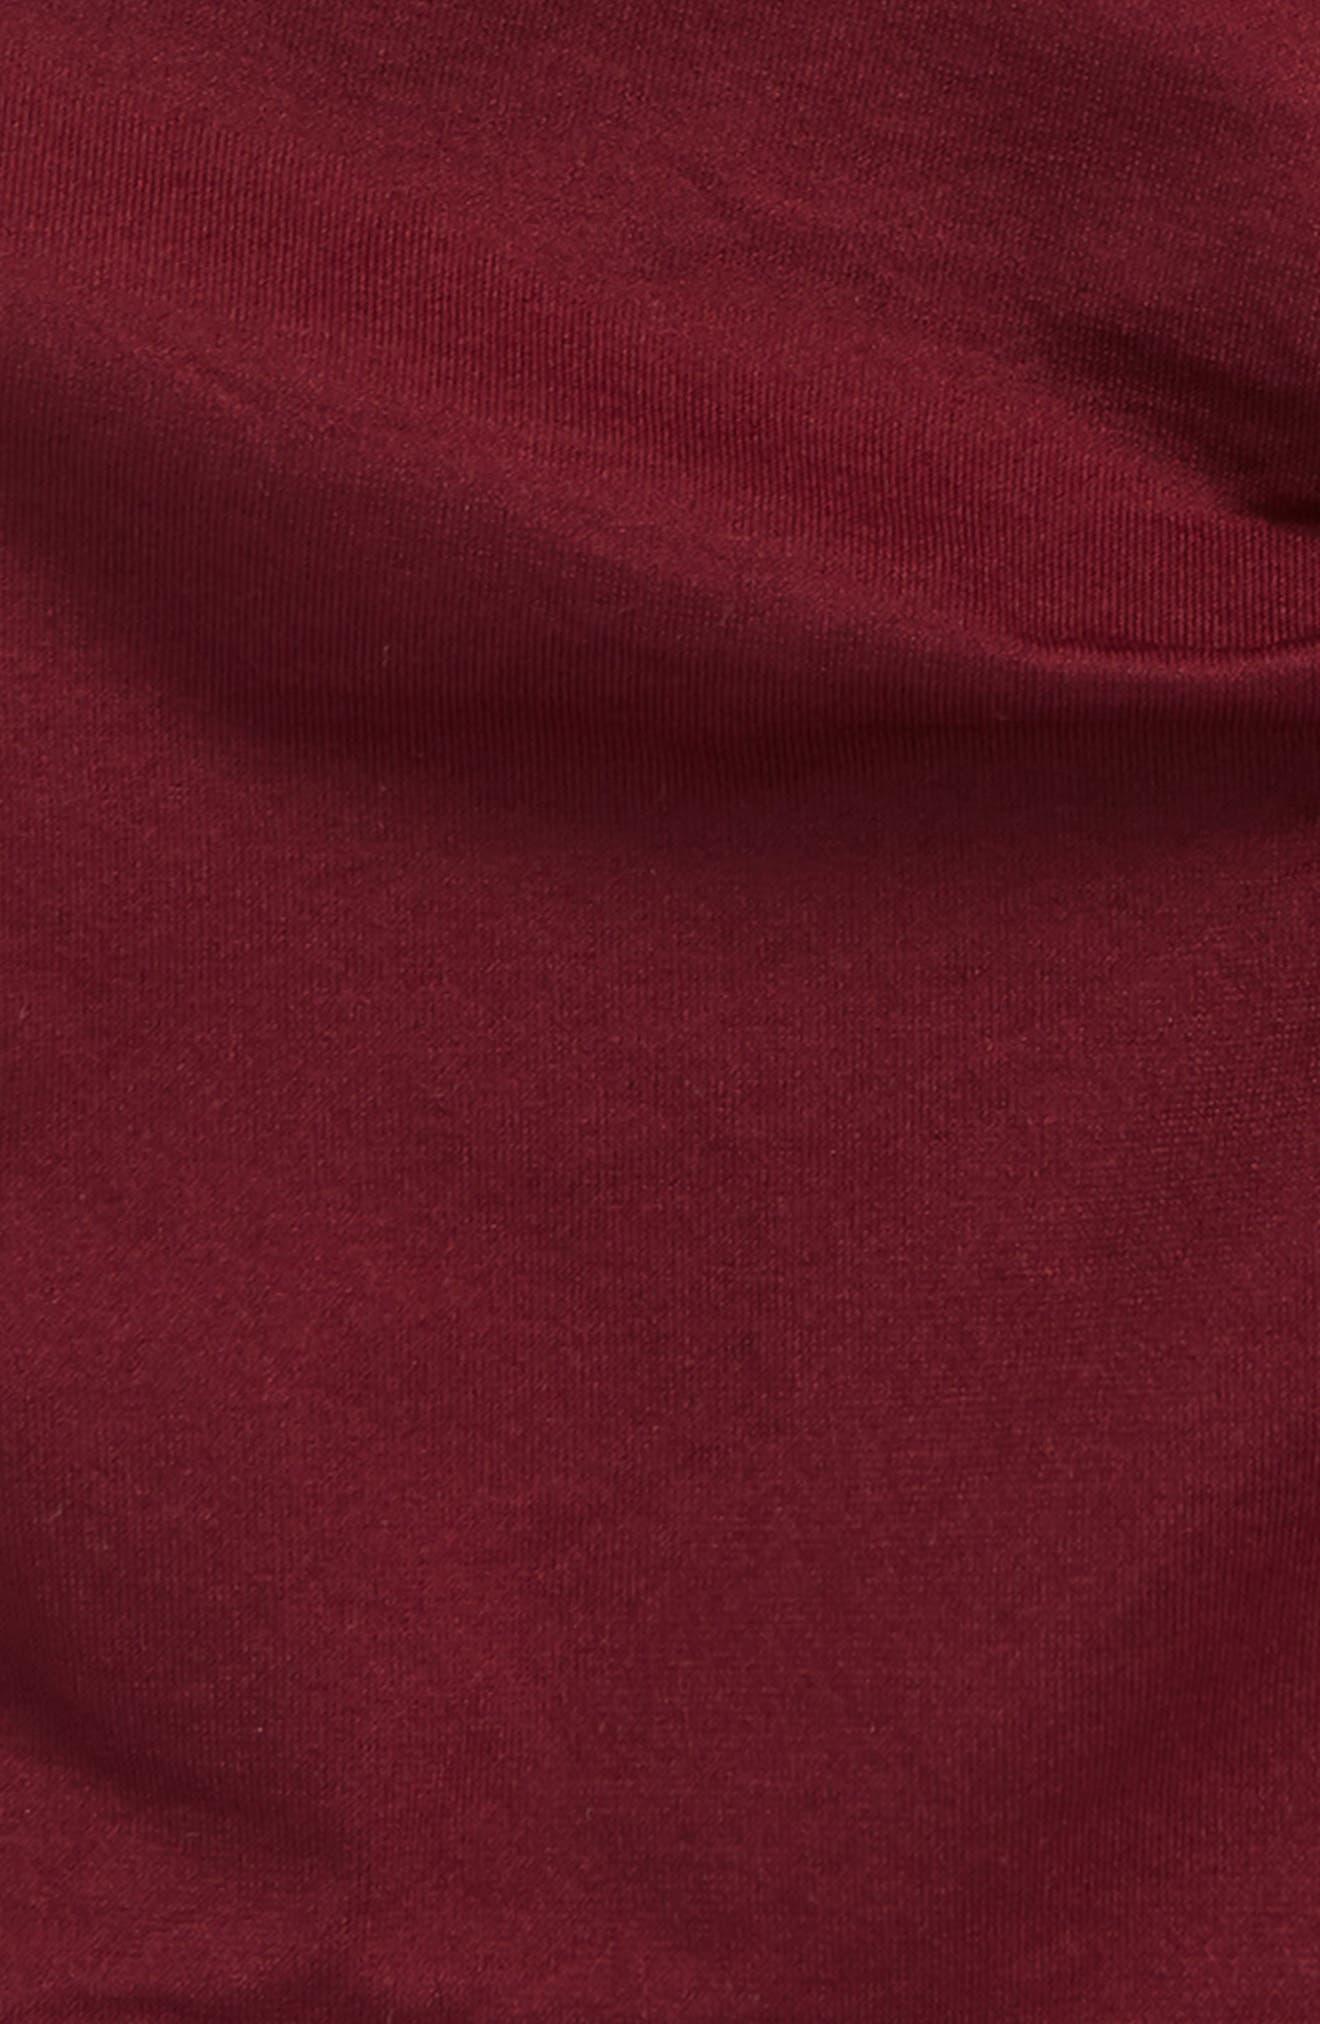 Alternate Image 2  - Suzette Collection Strappy Bralette (Big Girls)